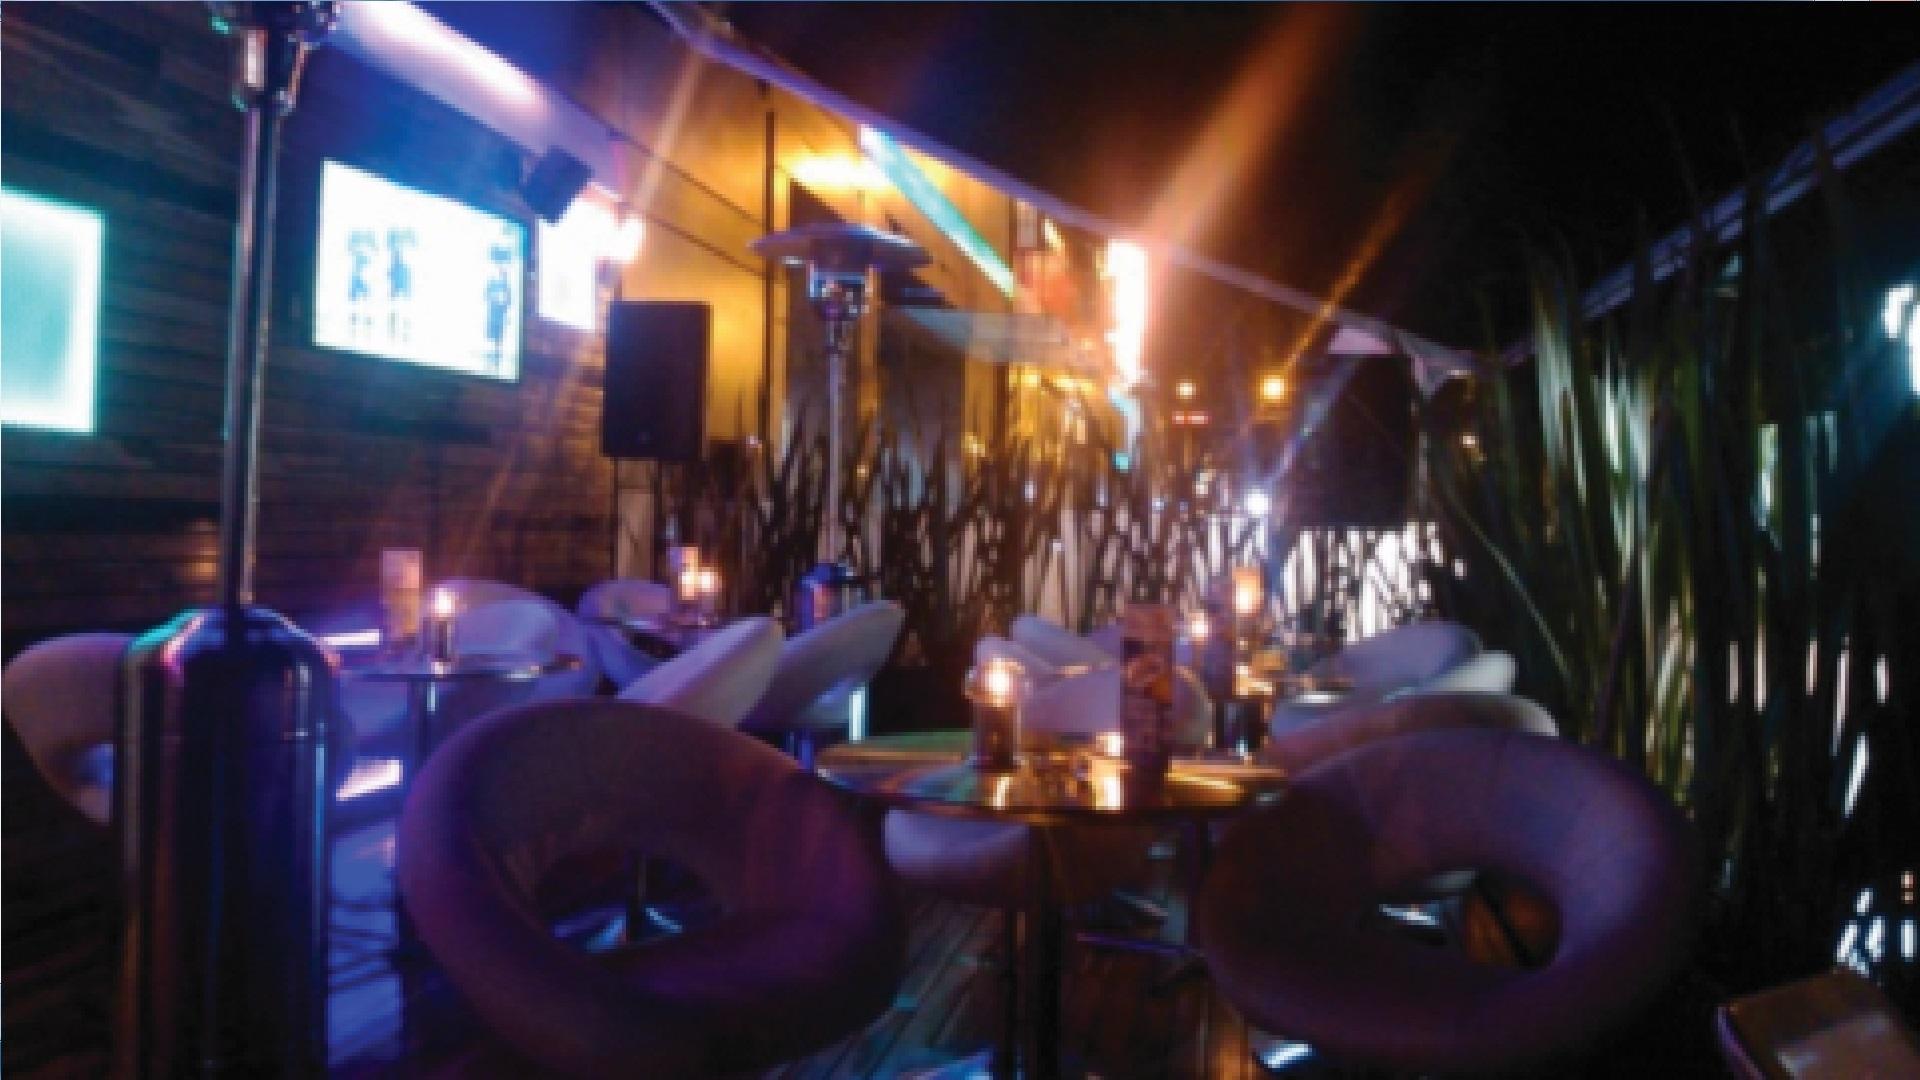 Gato Pardo Café Bar